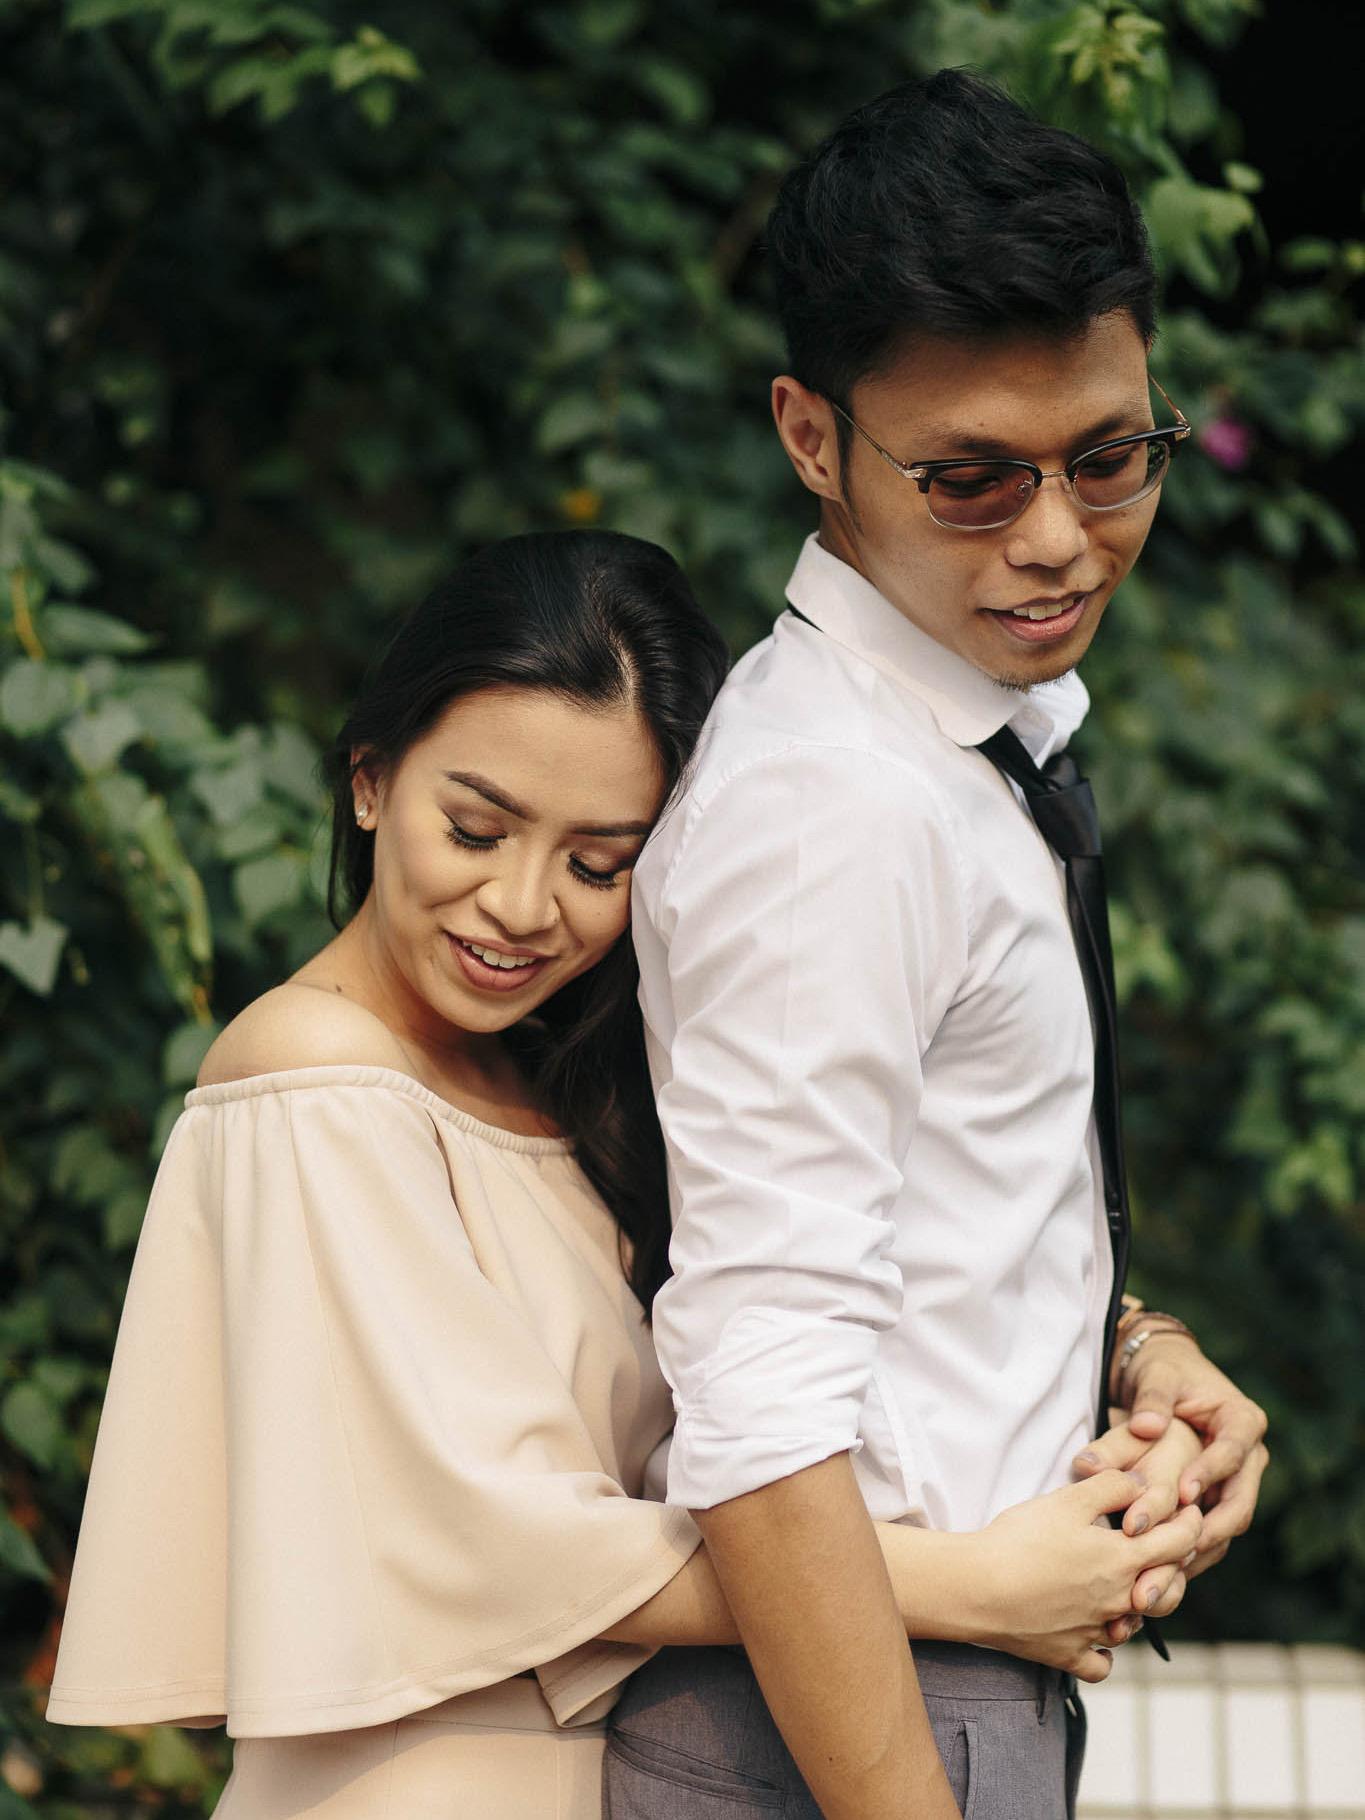 singapore-wedding-photographer-malay-travel-adli-tashah-04.jpg